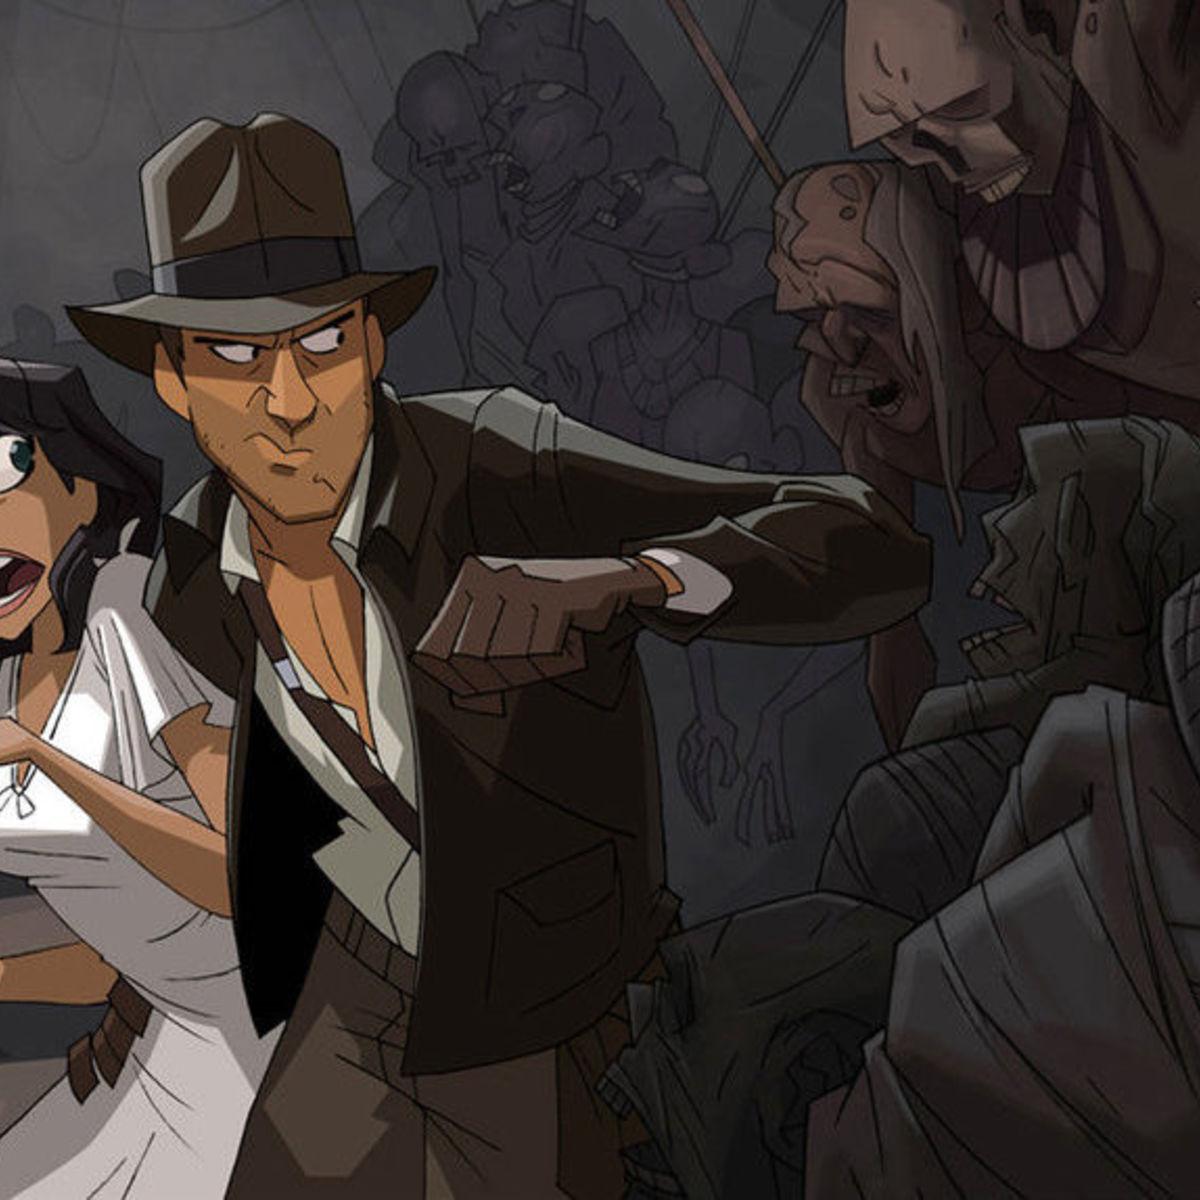 Indiana_Jones_-_The_Animated_Adventures_1.jpg